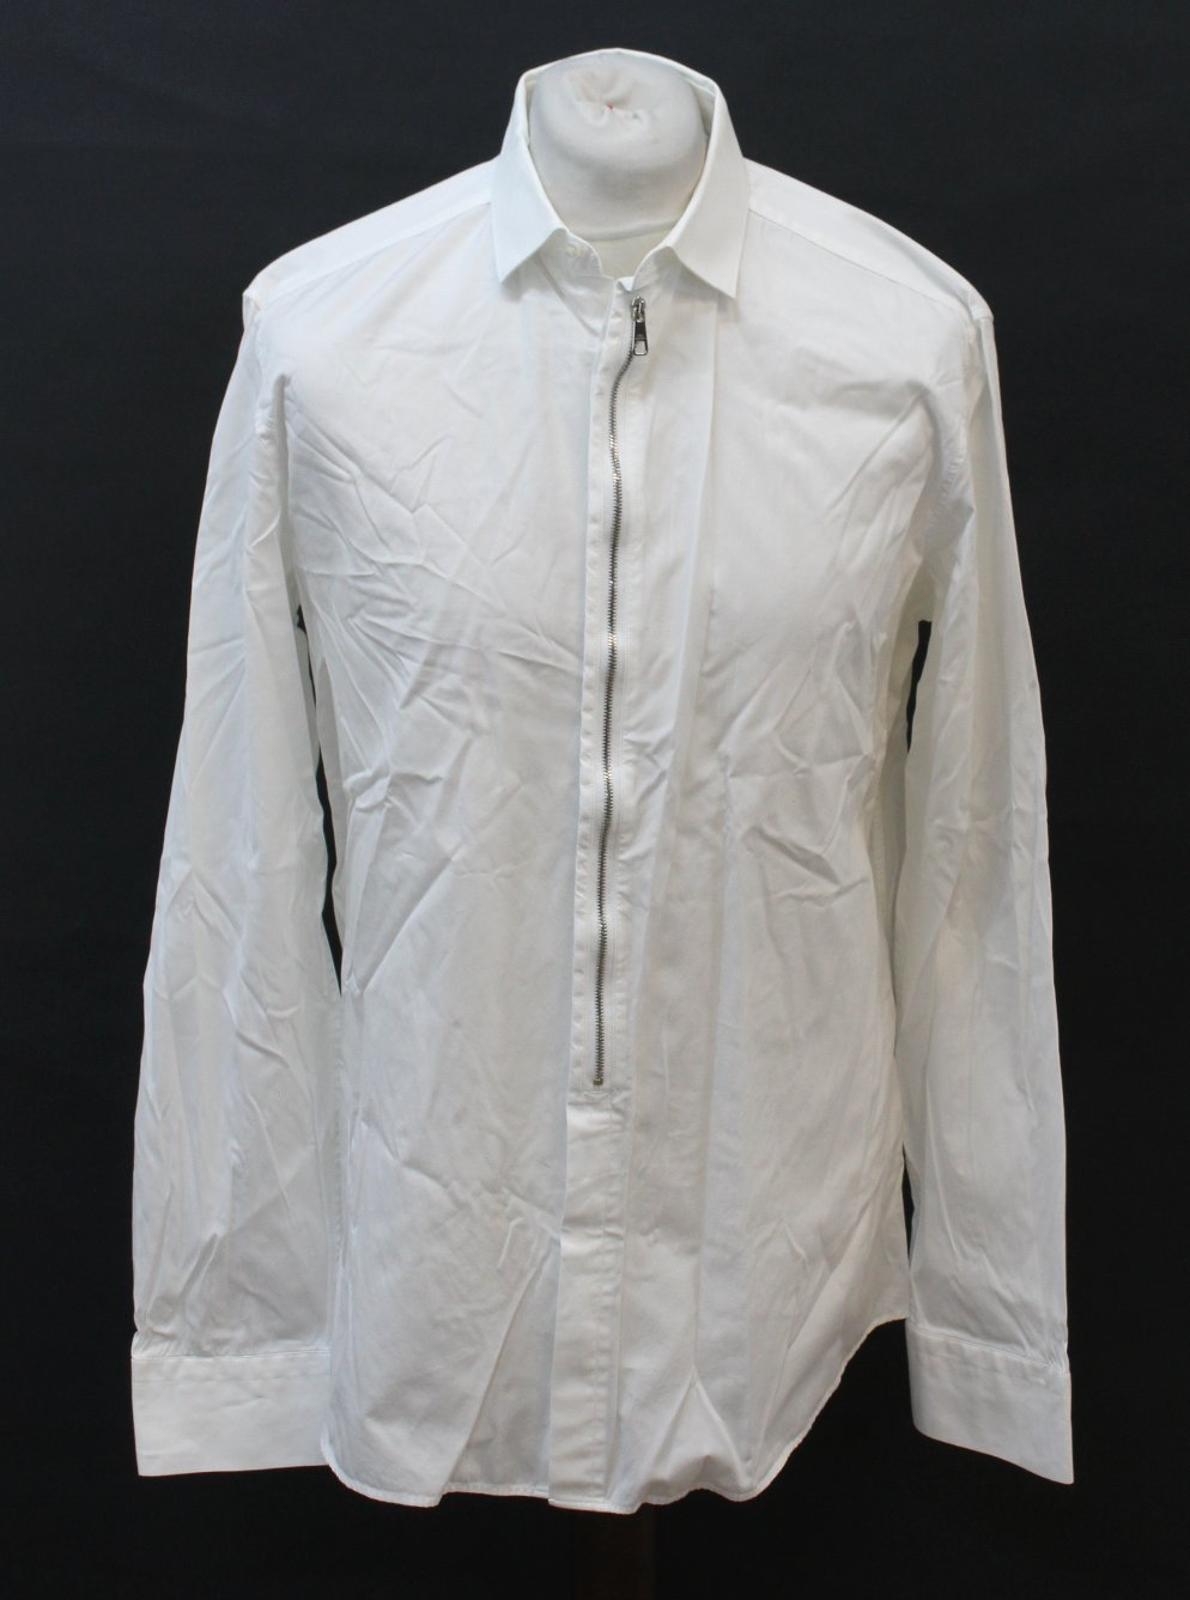 Neil-Barrett-para-hombre-calce-cenido-de-algodon-Blanco-Detalle-De-Cremallera-Botones-Camisa-Cuello miniatura 10